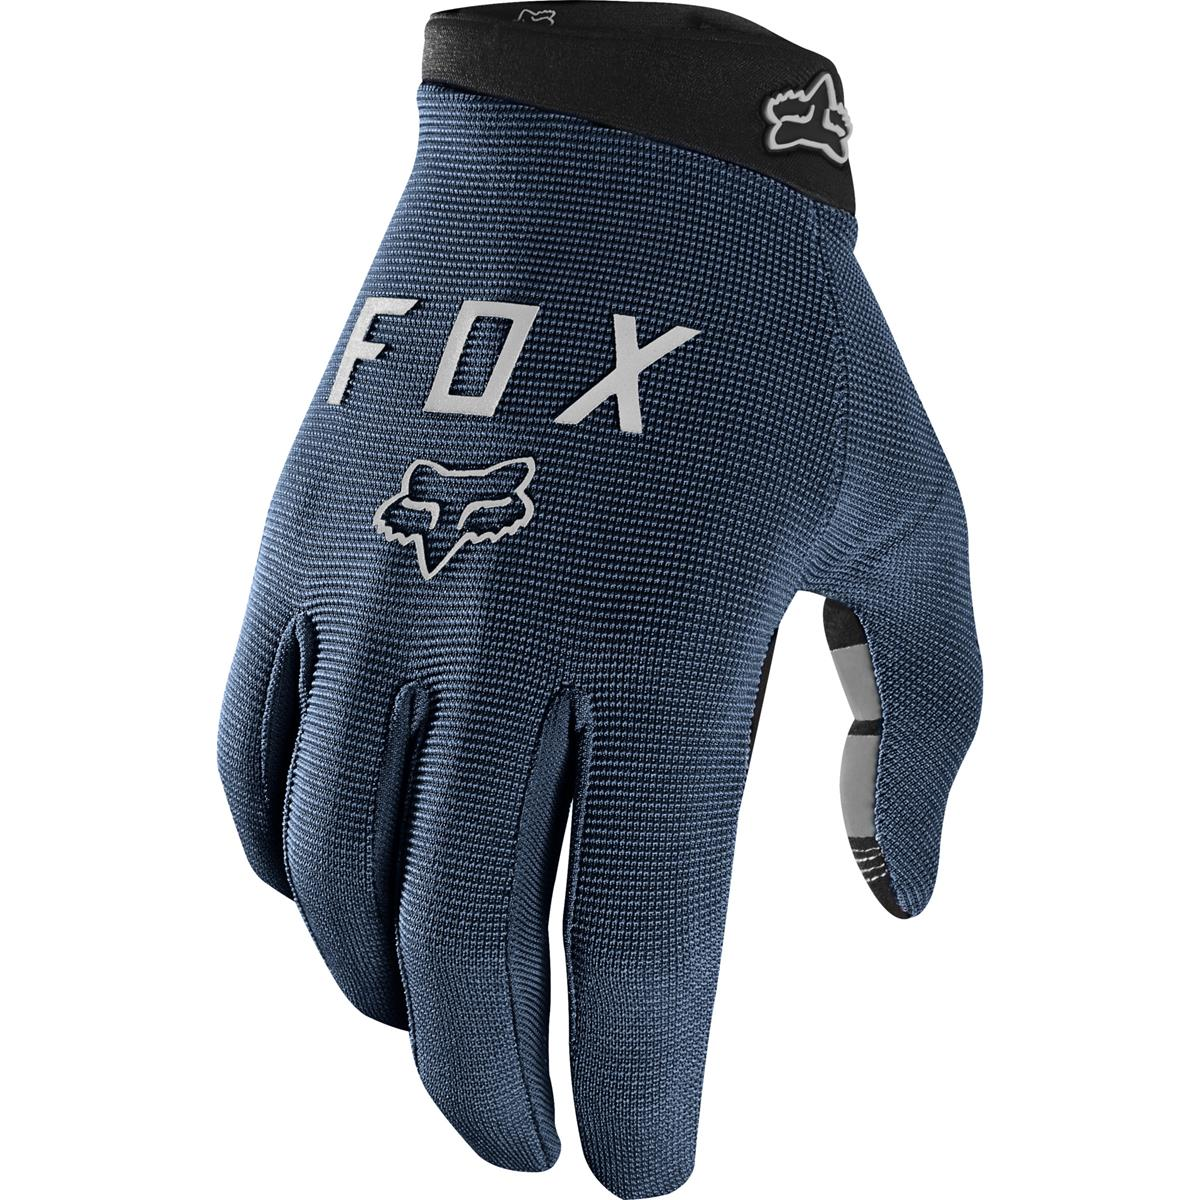 Fox Bike-Handschuhe Ranger Midnight